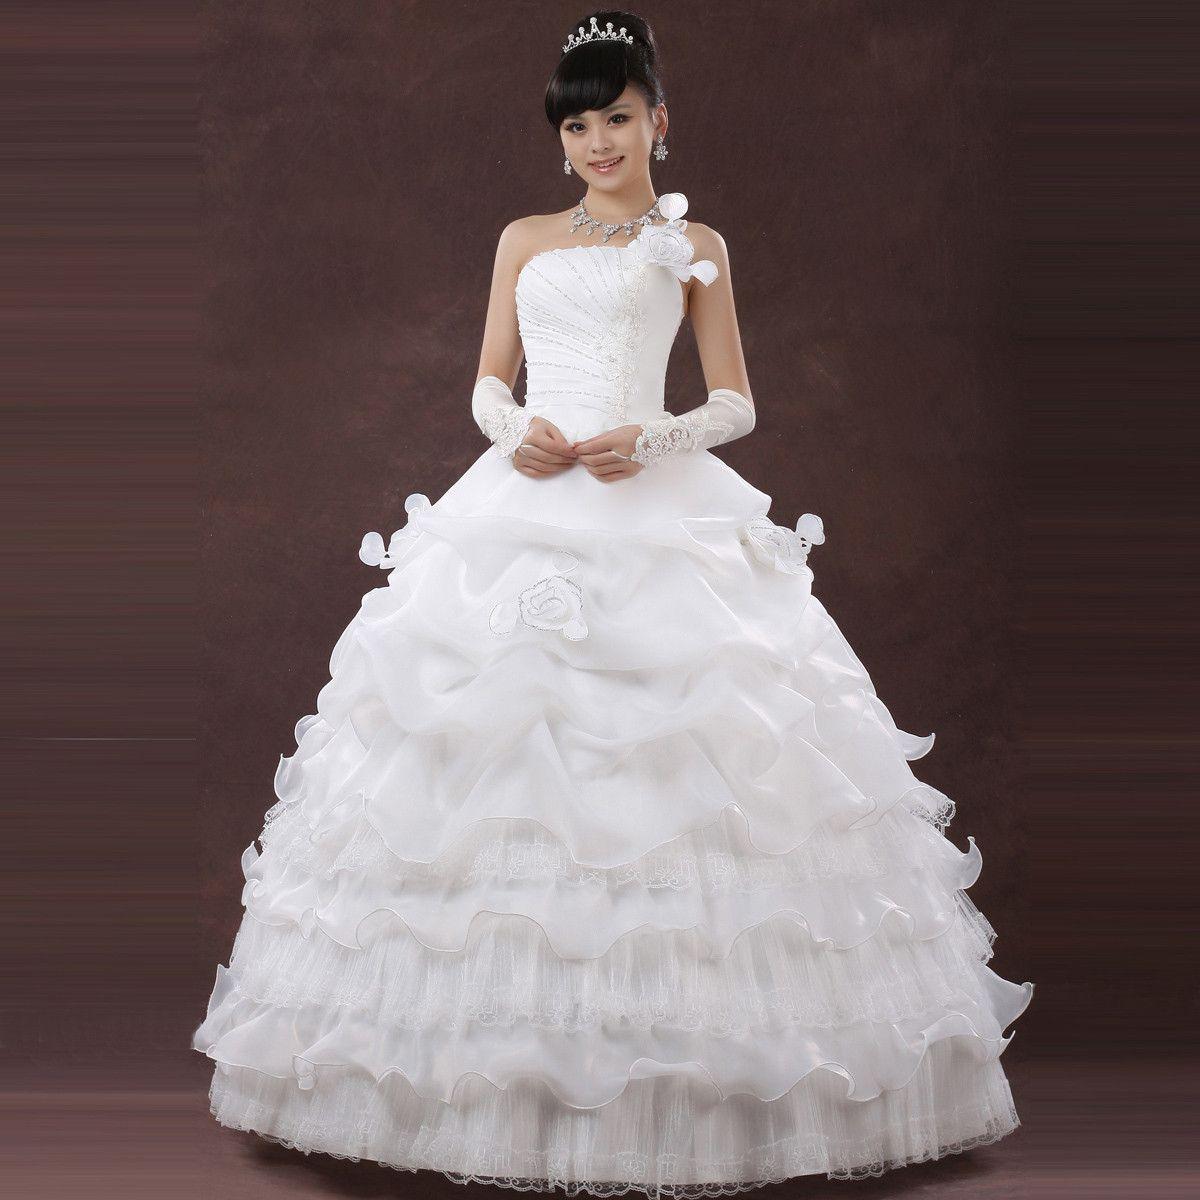 nice dresses for wedding Cute Cheap Wedding Dresses